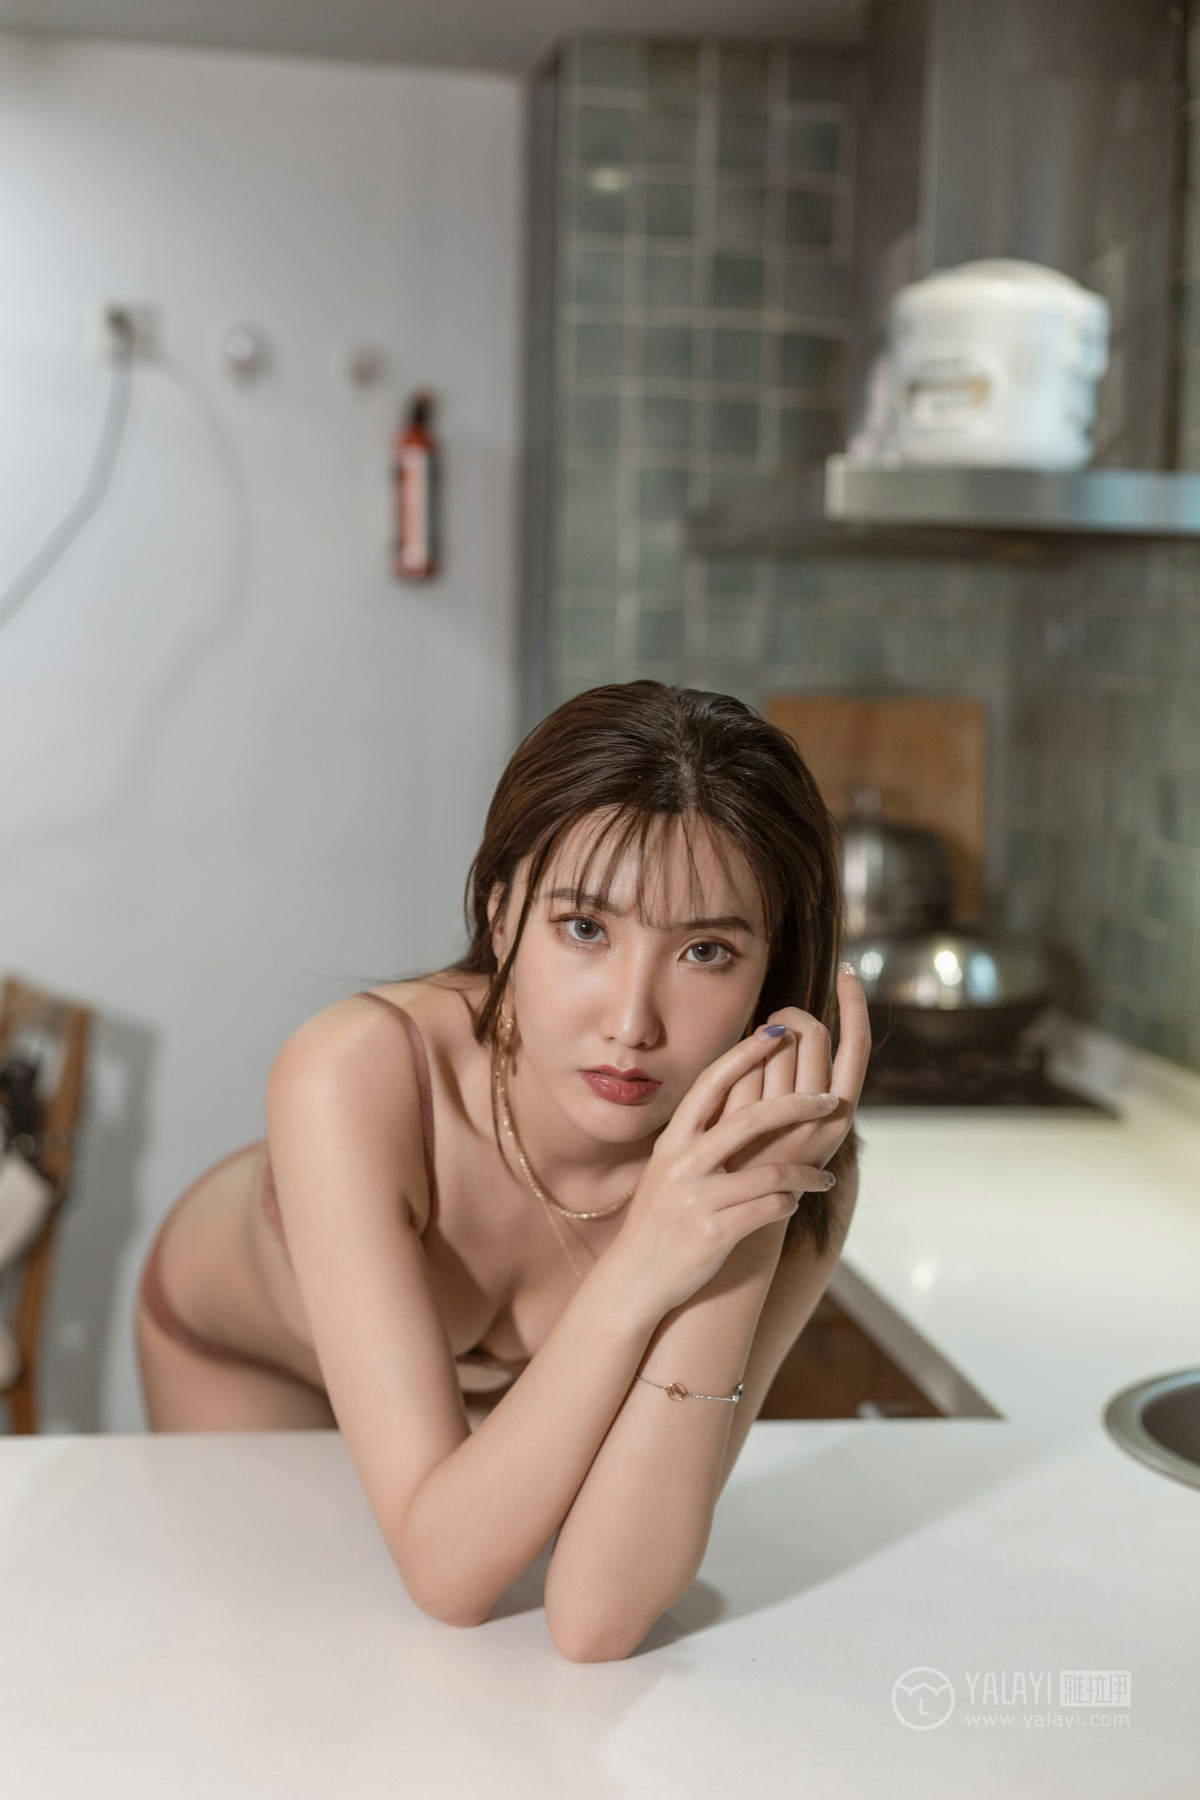 [YALAYI雅拉伊]2019.05.29 Y292 沈美美《说不出的感觉》[42P] 雅拉伊 第23张